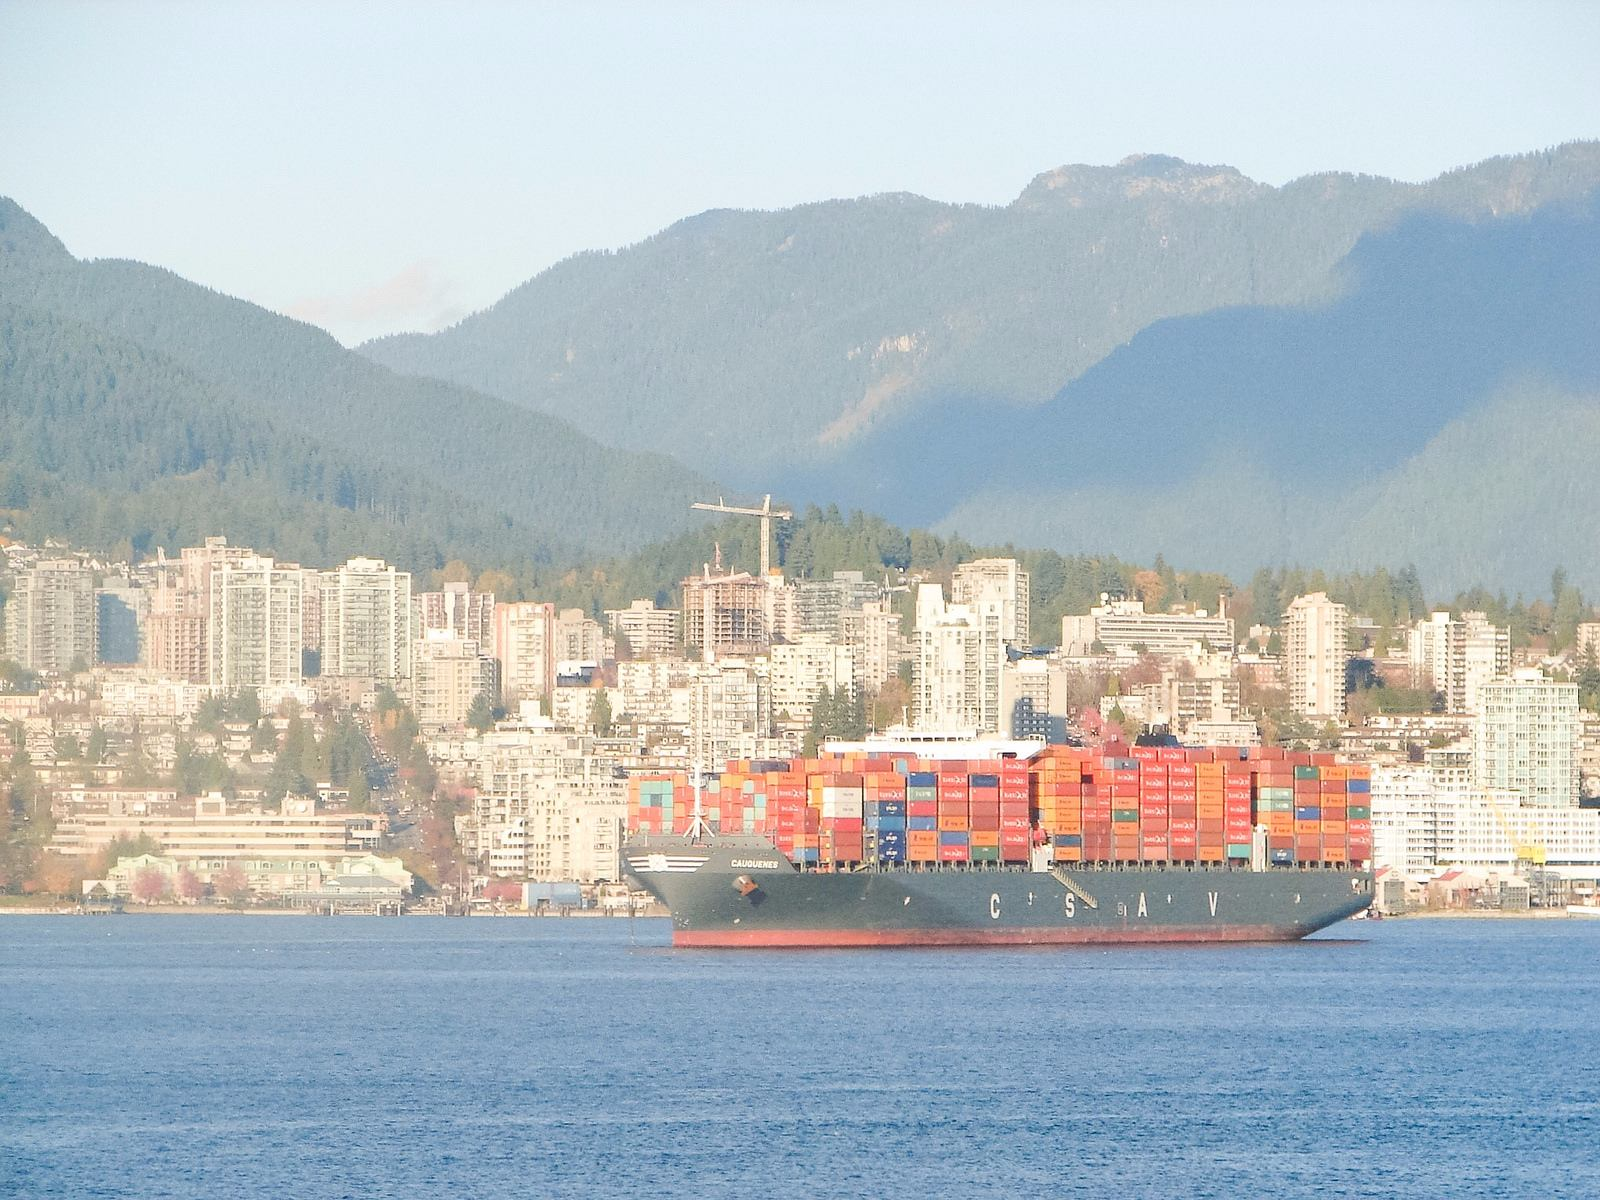 Detached home sales plummet almost 50 per cent in Metro Vancouver